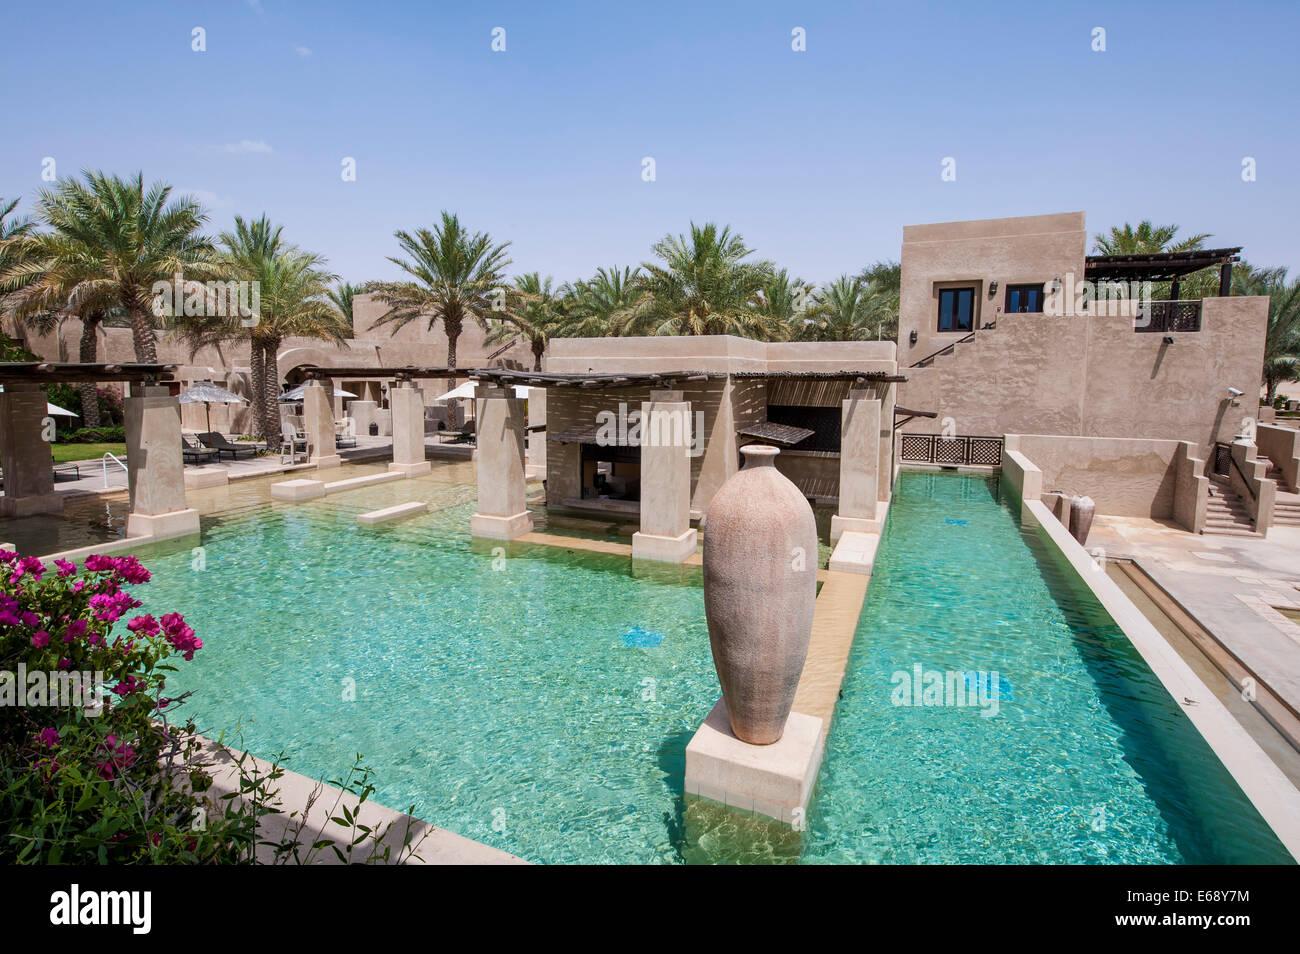 Swimming Pool Deck Patio Area At The Bab Al Shams Desert Resort Stock Photo Alamy